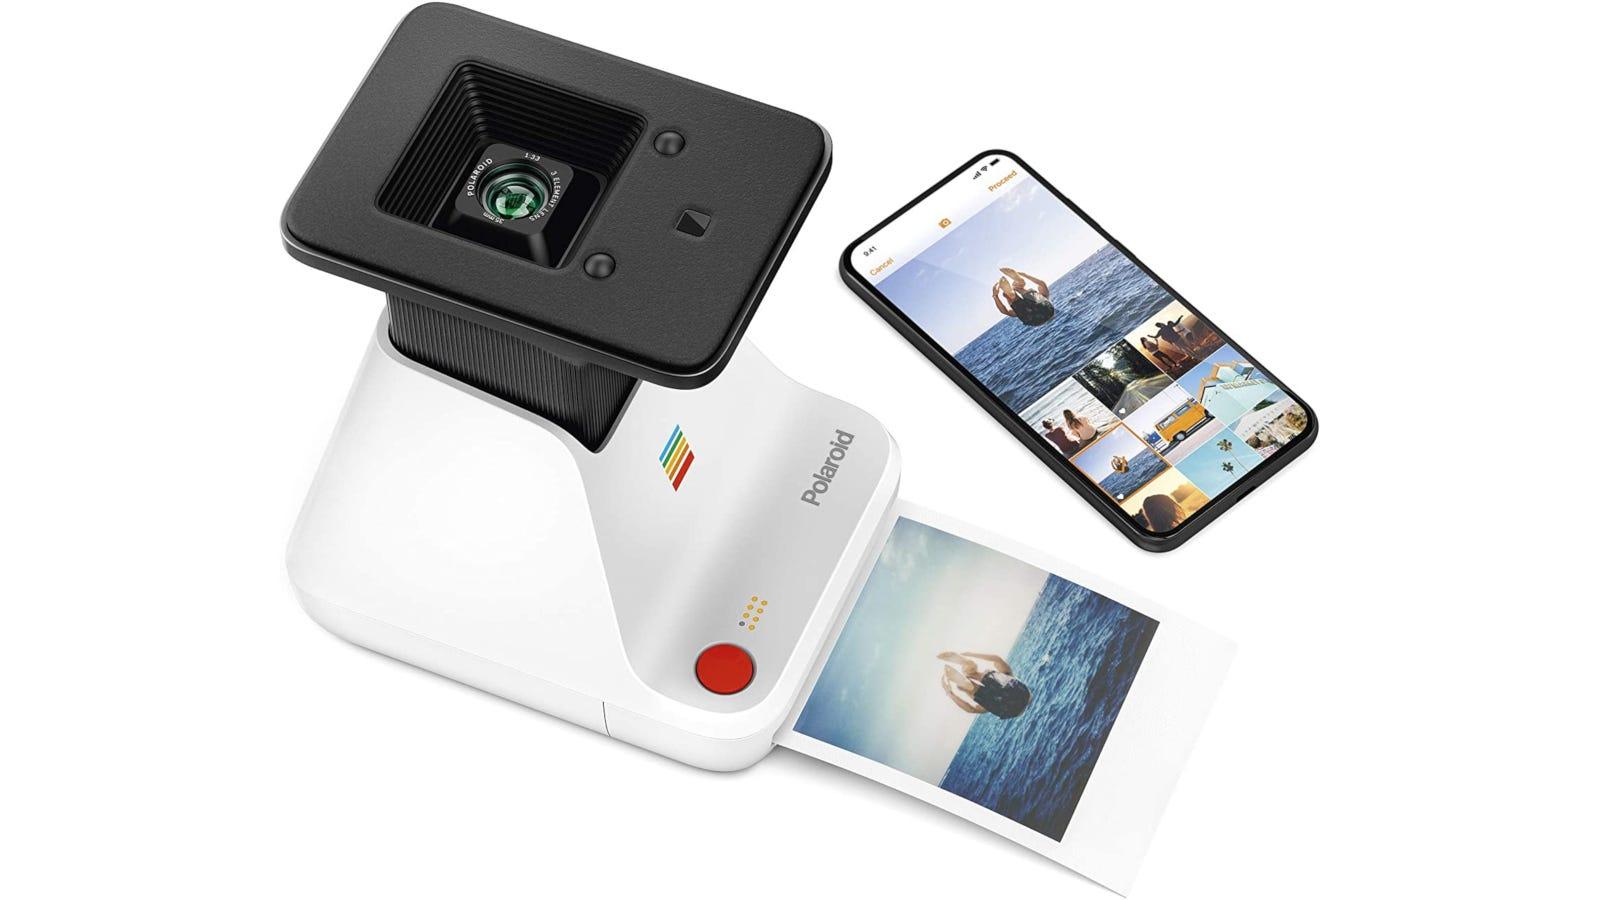 White and black Polaroid photo printer with smartphone compatibility